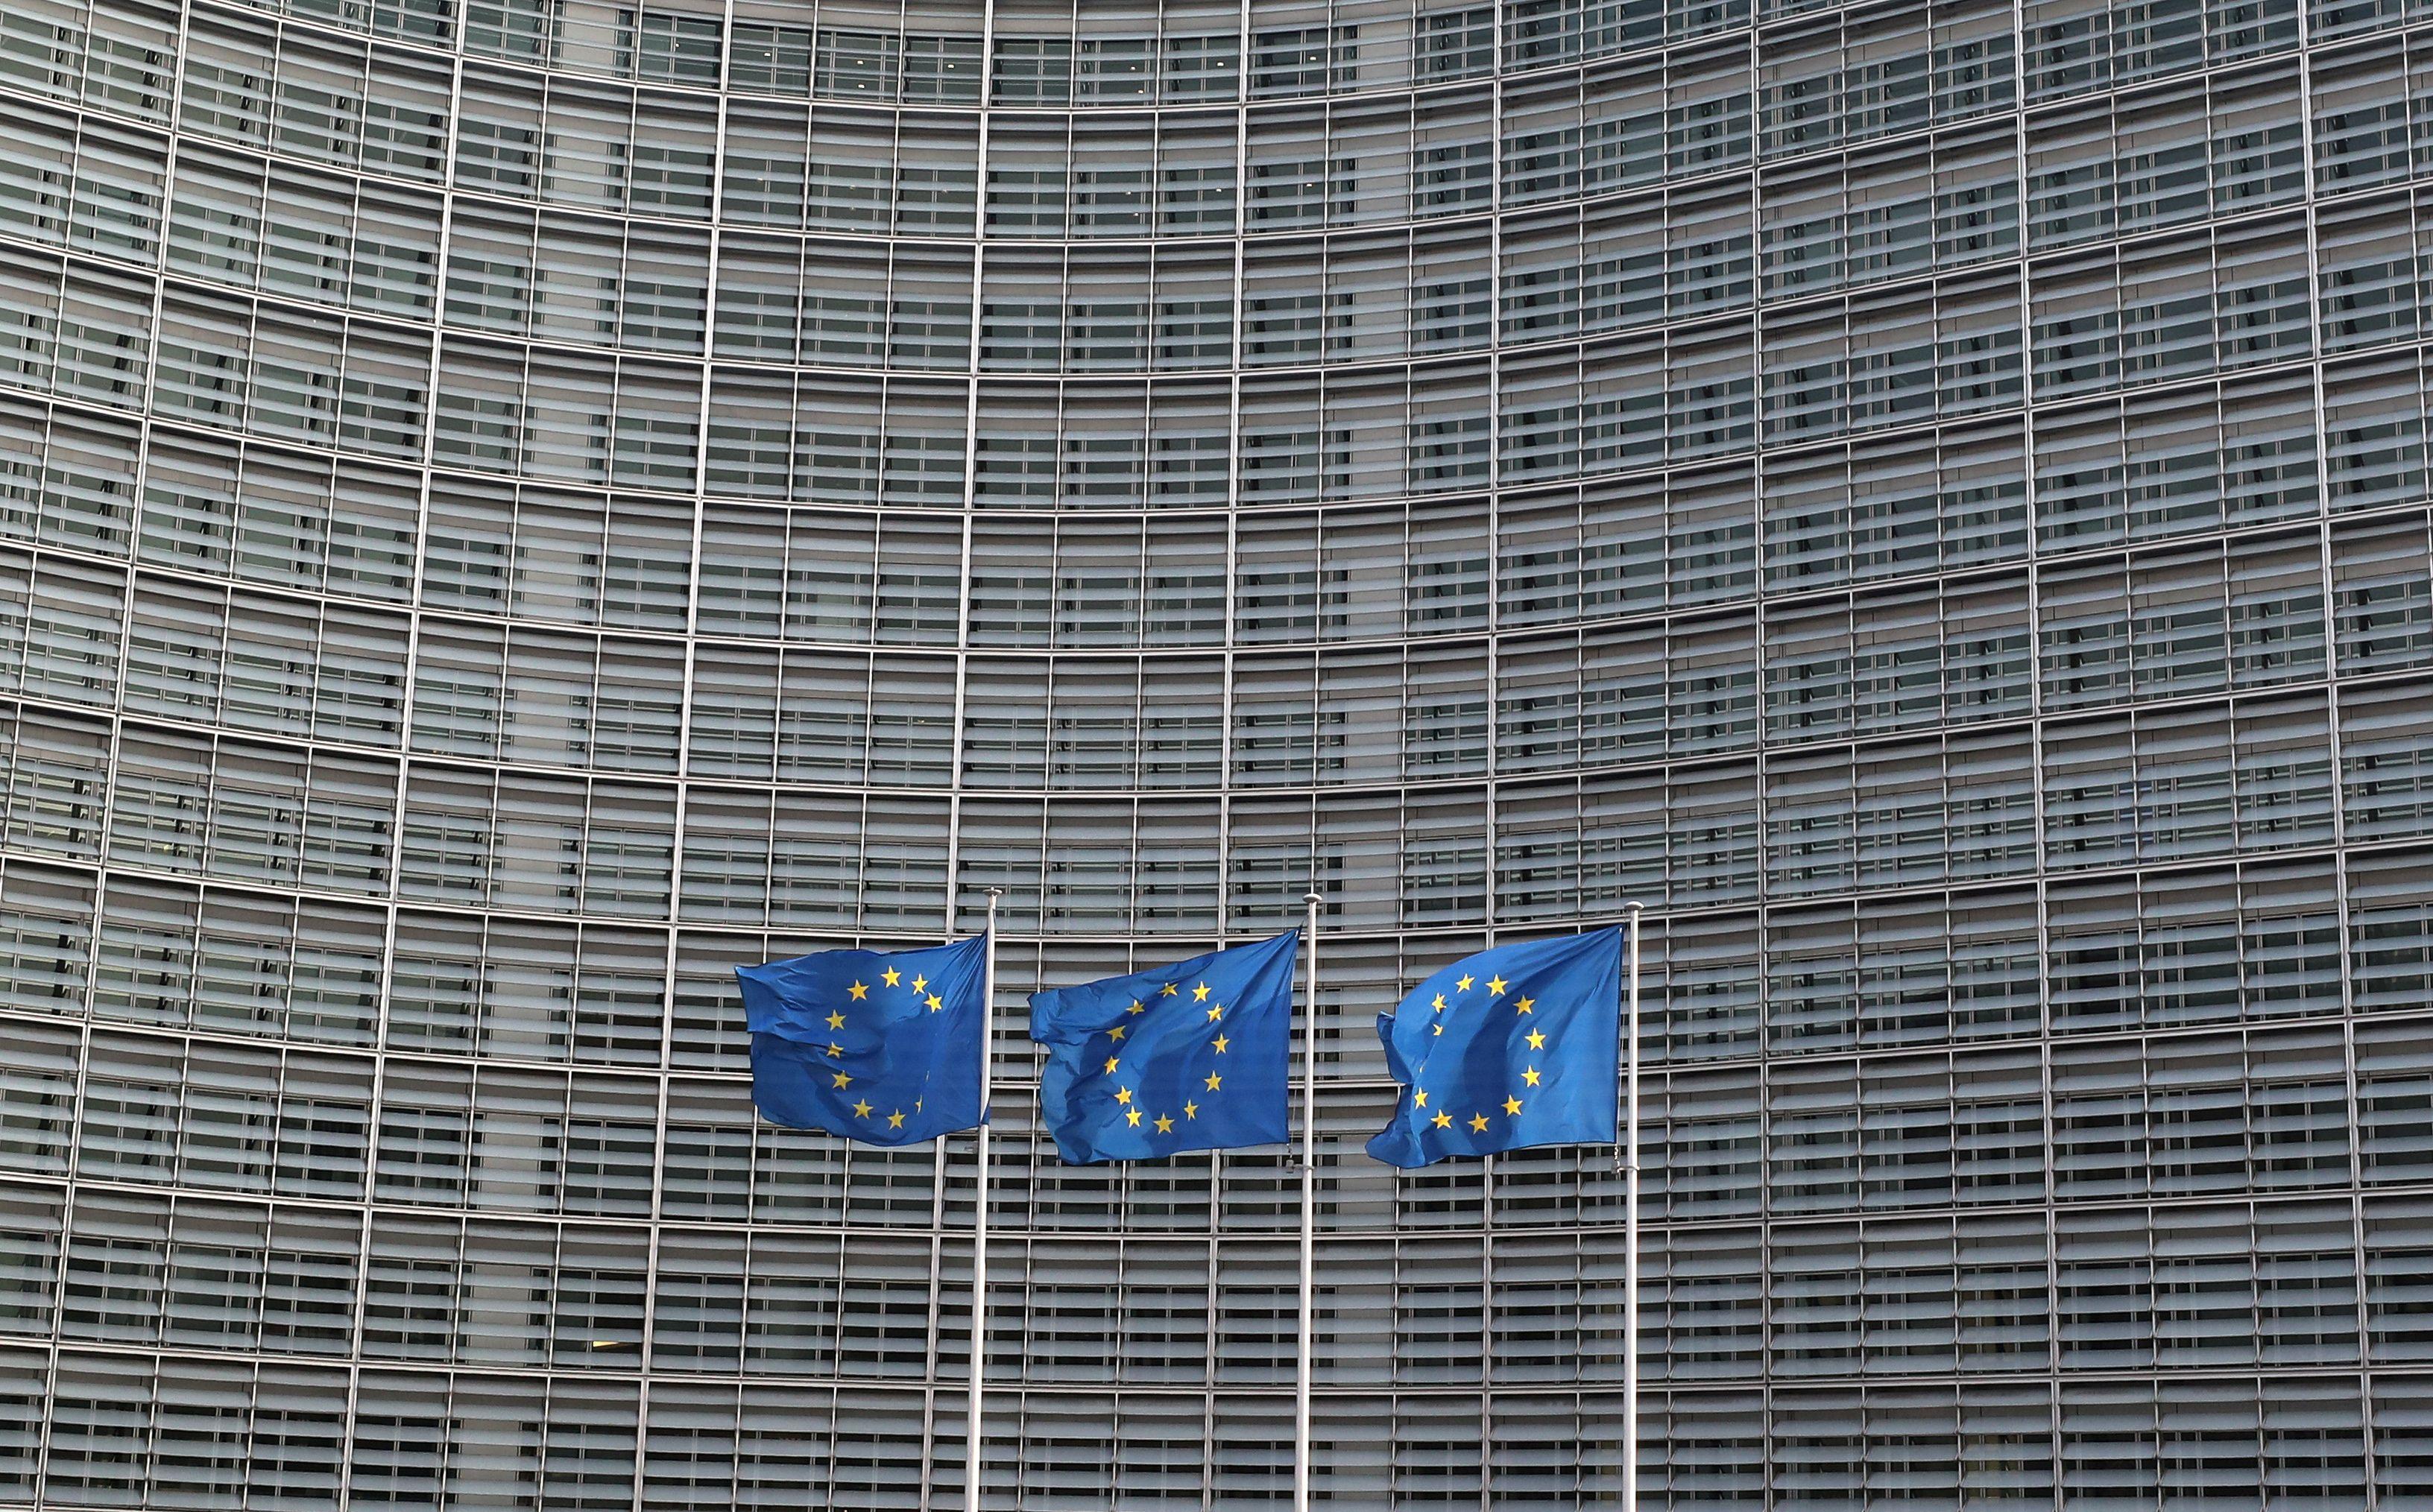 EU begins assisting repatriations from China as coronavirus spreads